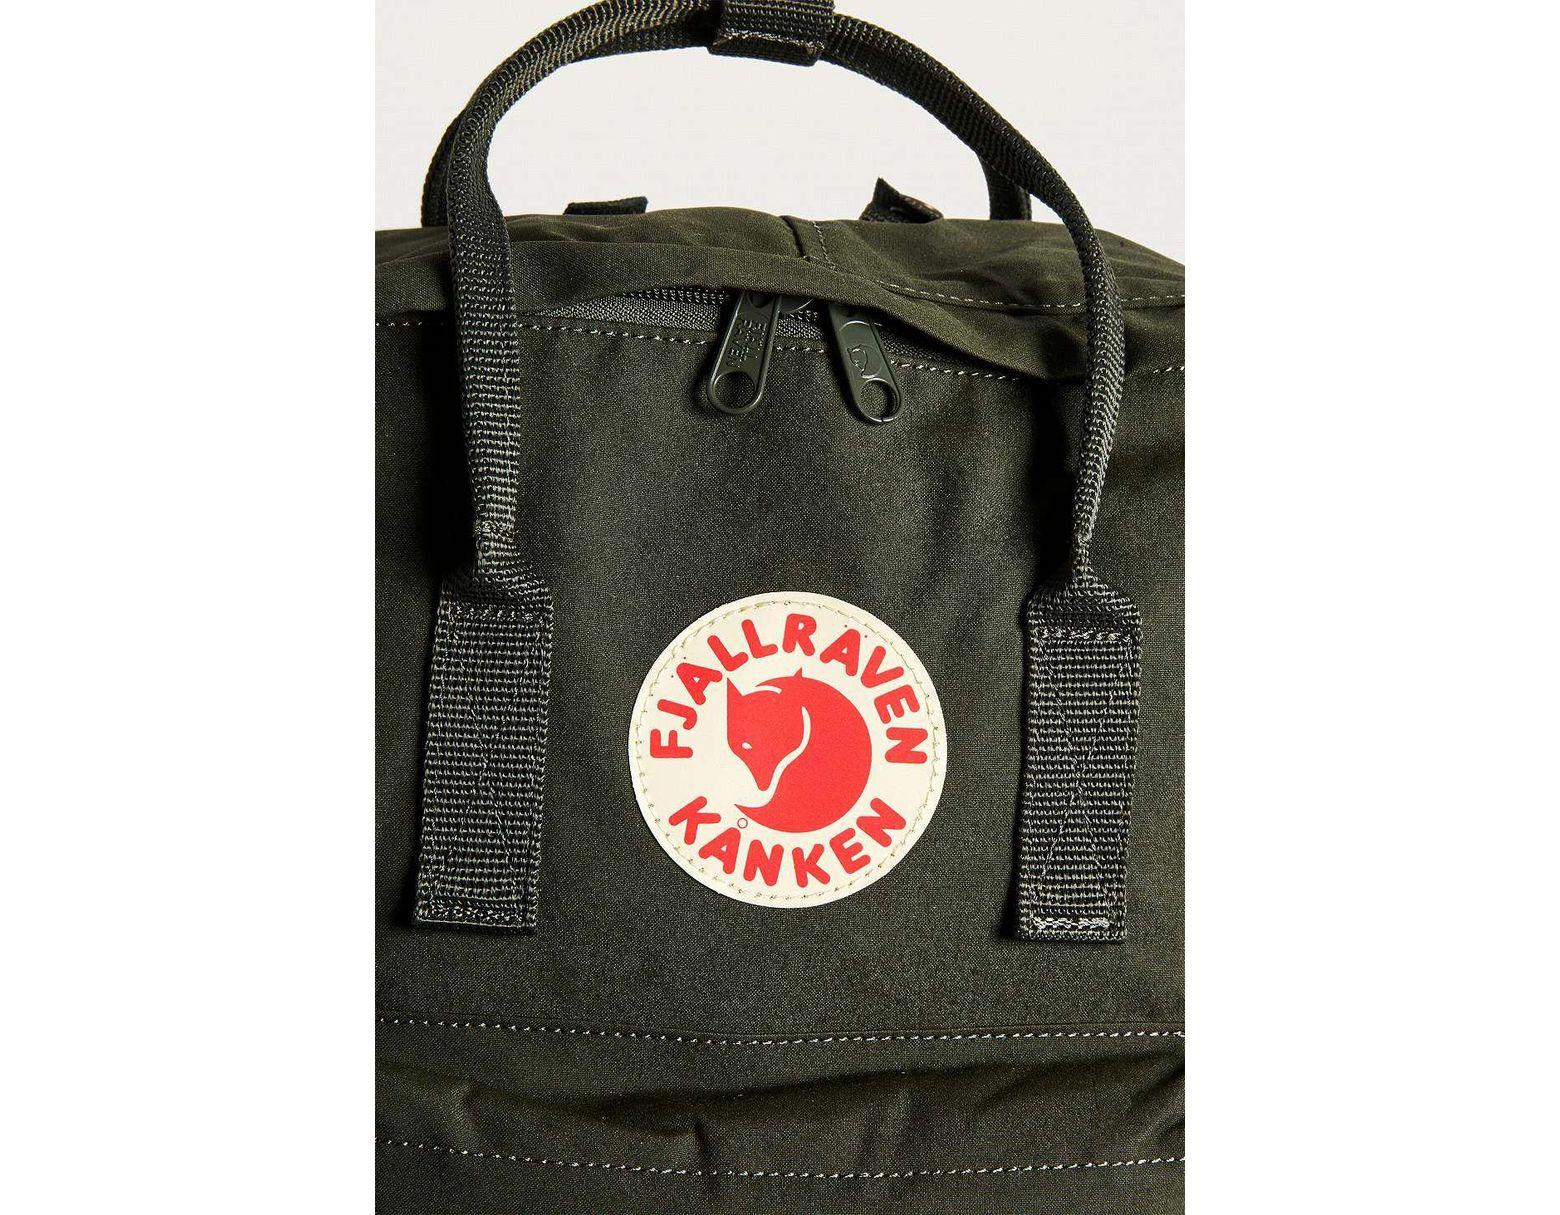 262d517aa Fjallraven Kanken Deep Forest Backpack - Womens All in Green - Lyst